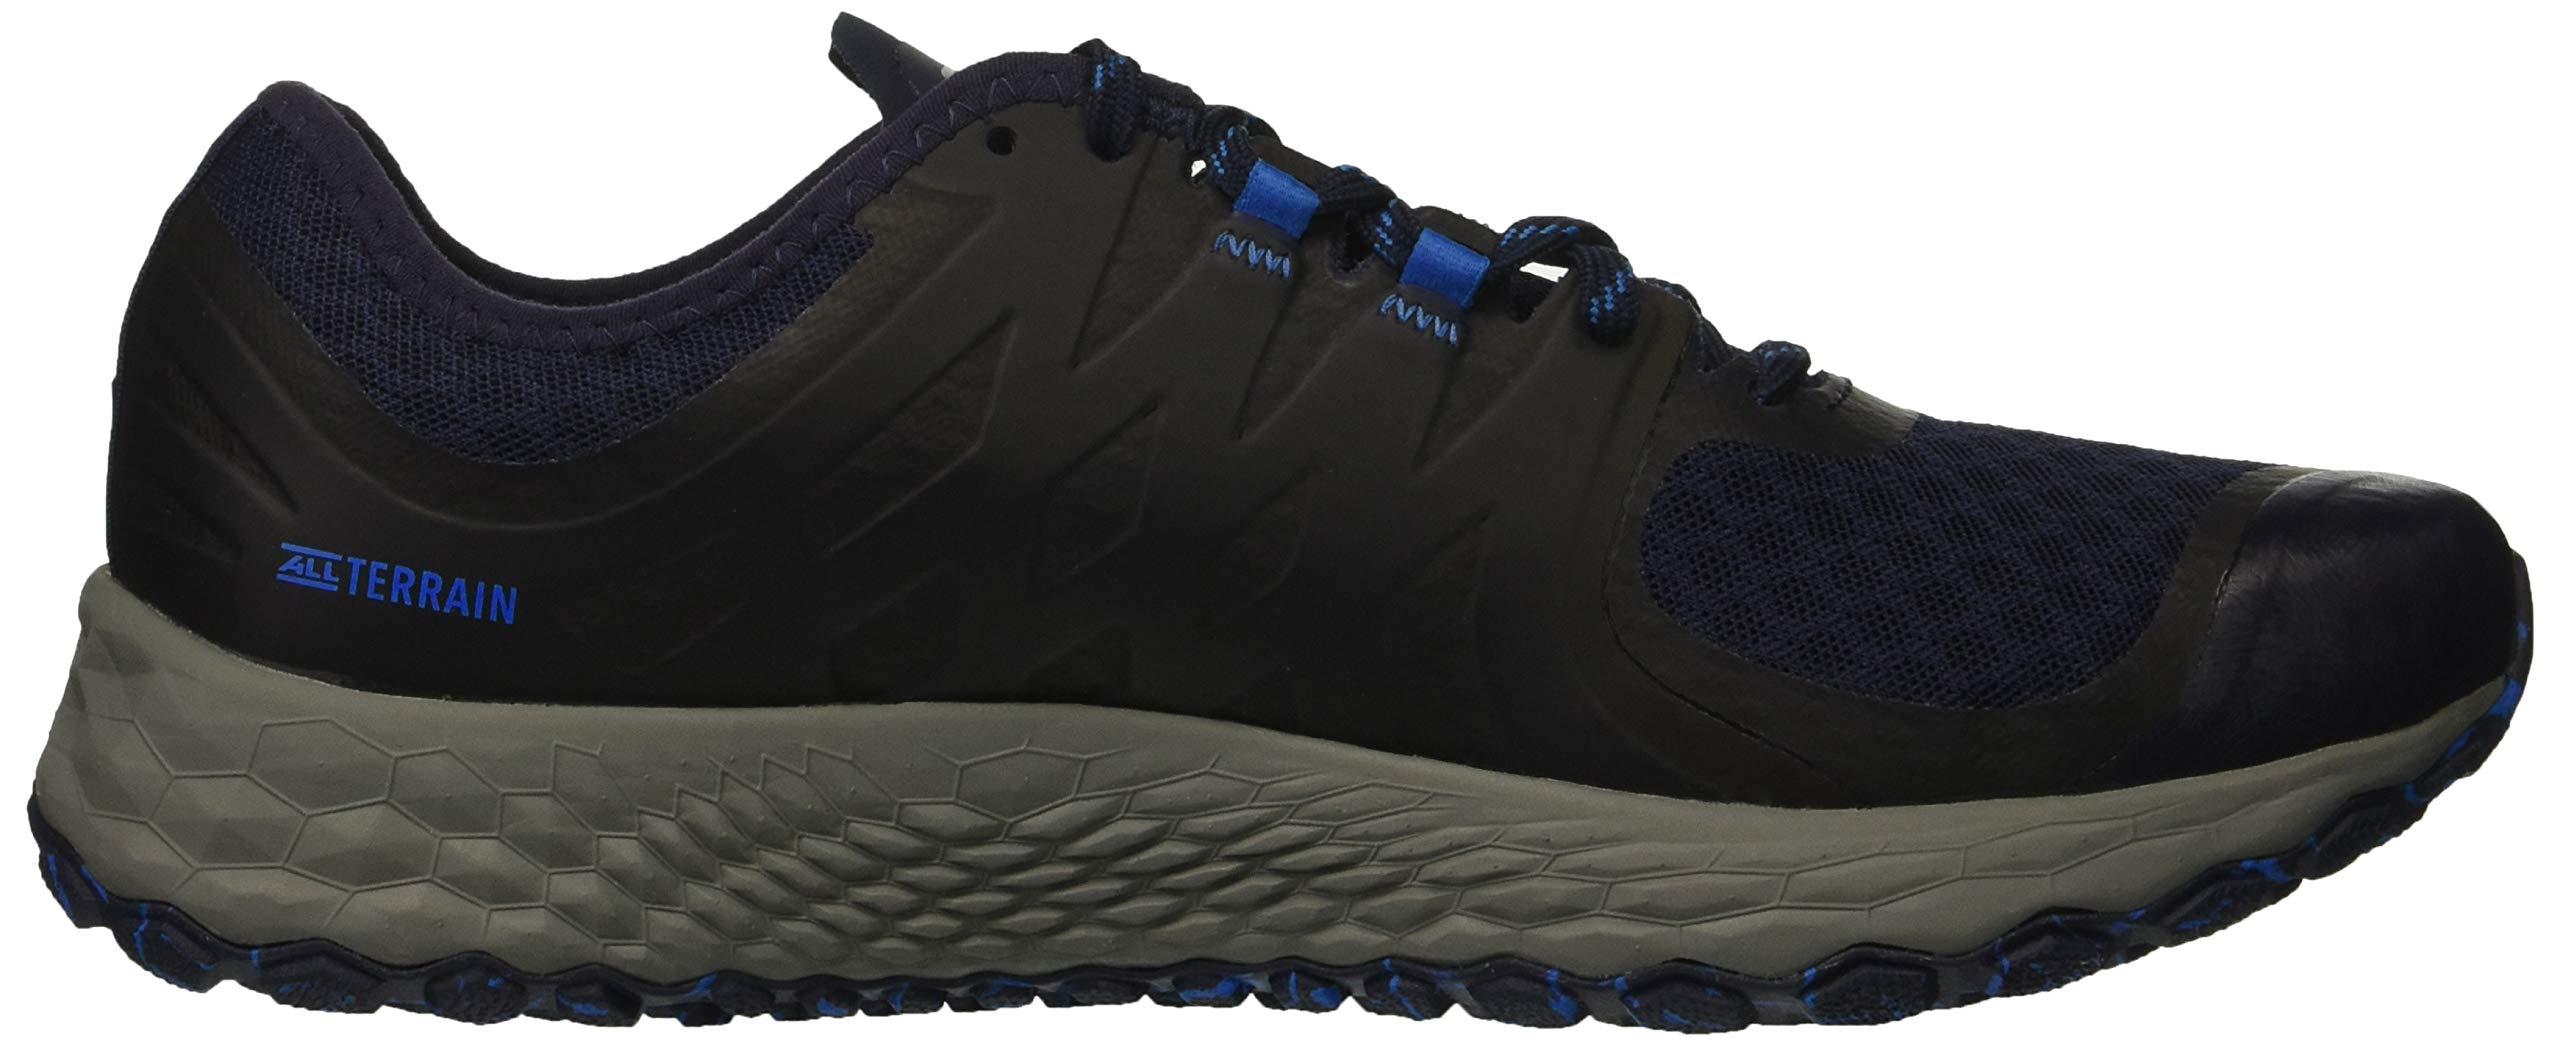 New Balance Men's Kaymin V1 Fresh Foam Trail Running Shoe Pigment/Laser Blue 1.5 D US by New Balance (Image #7)